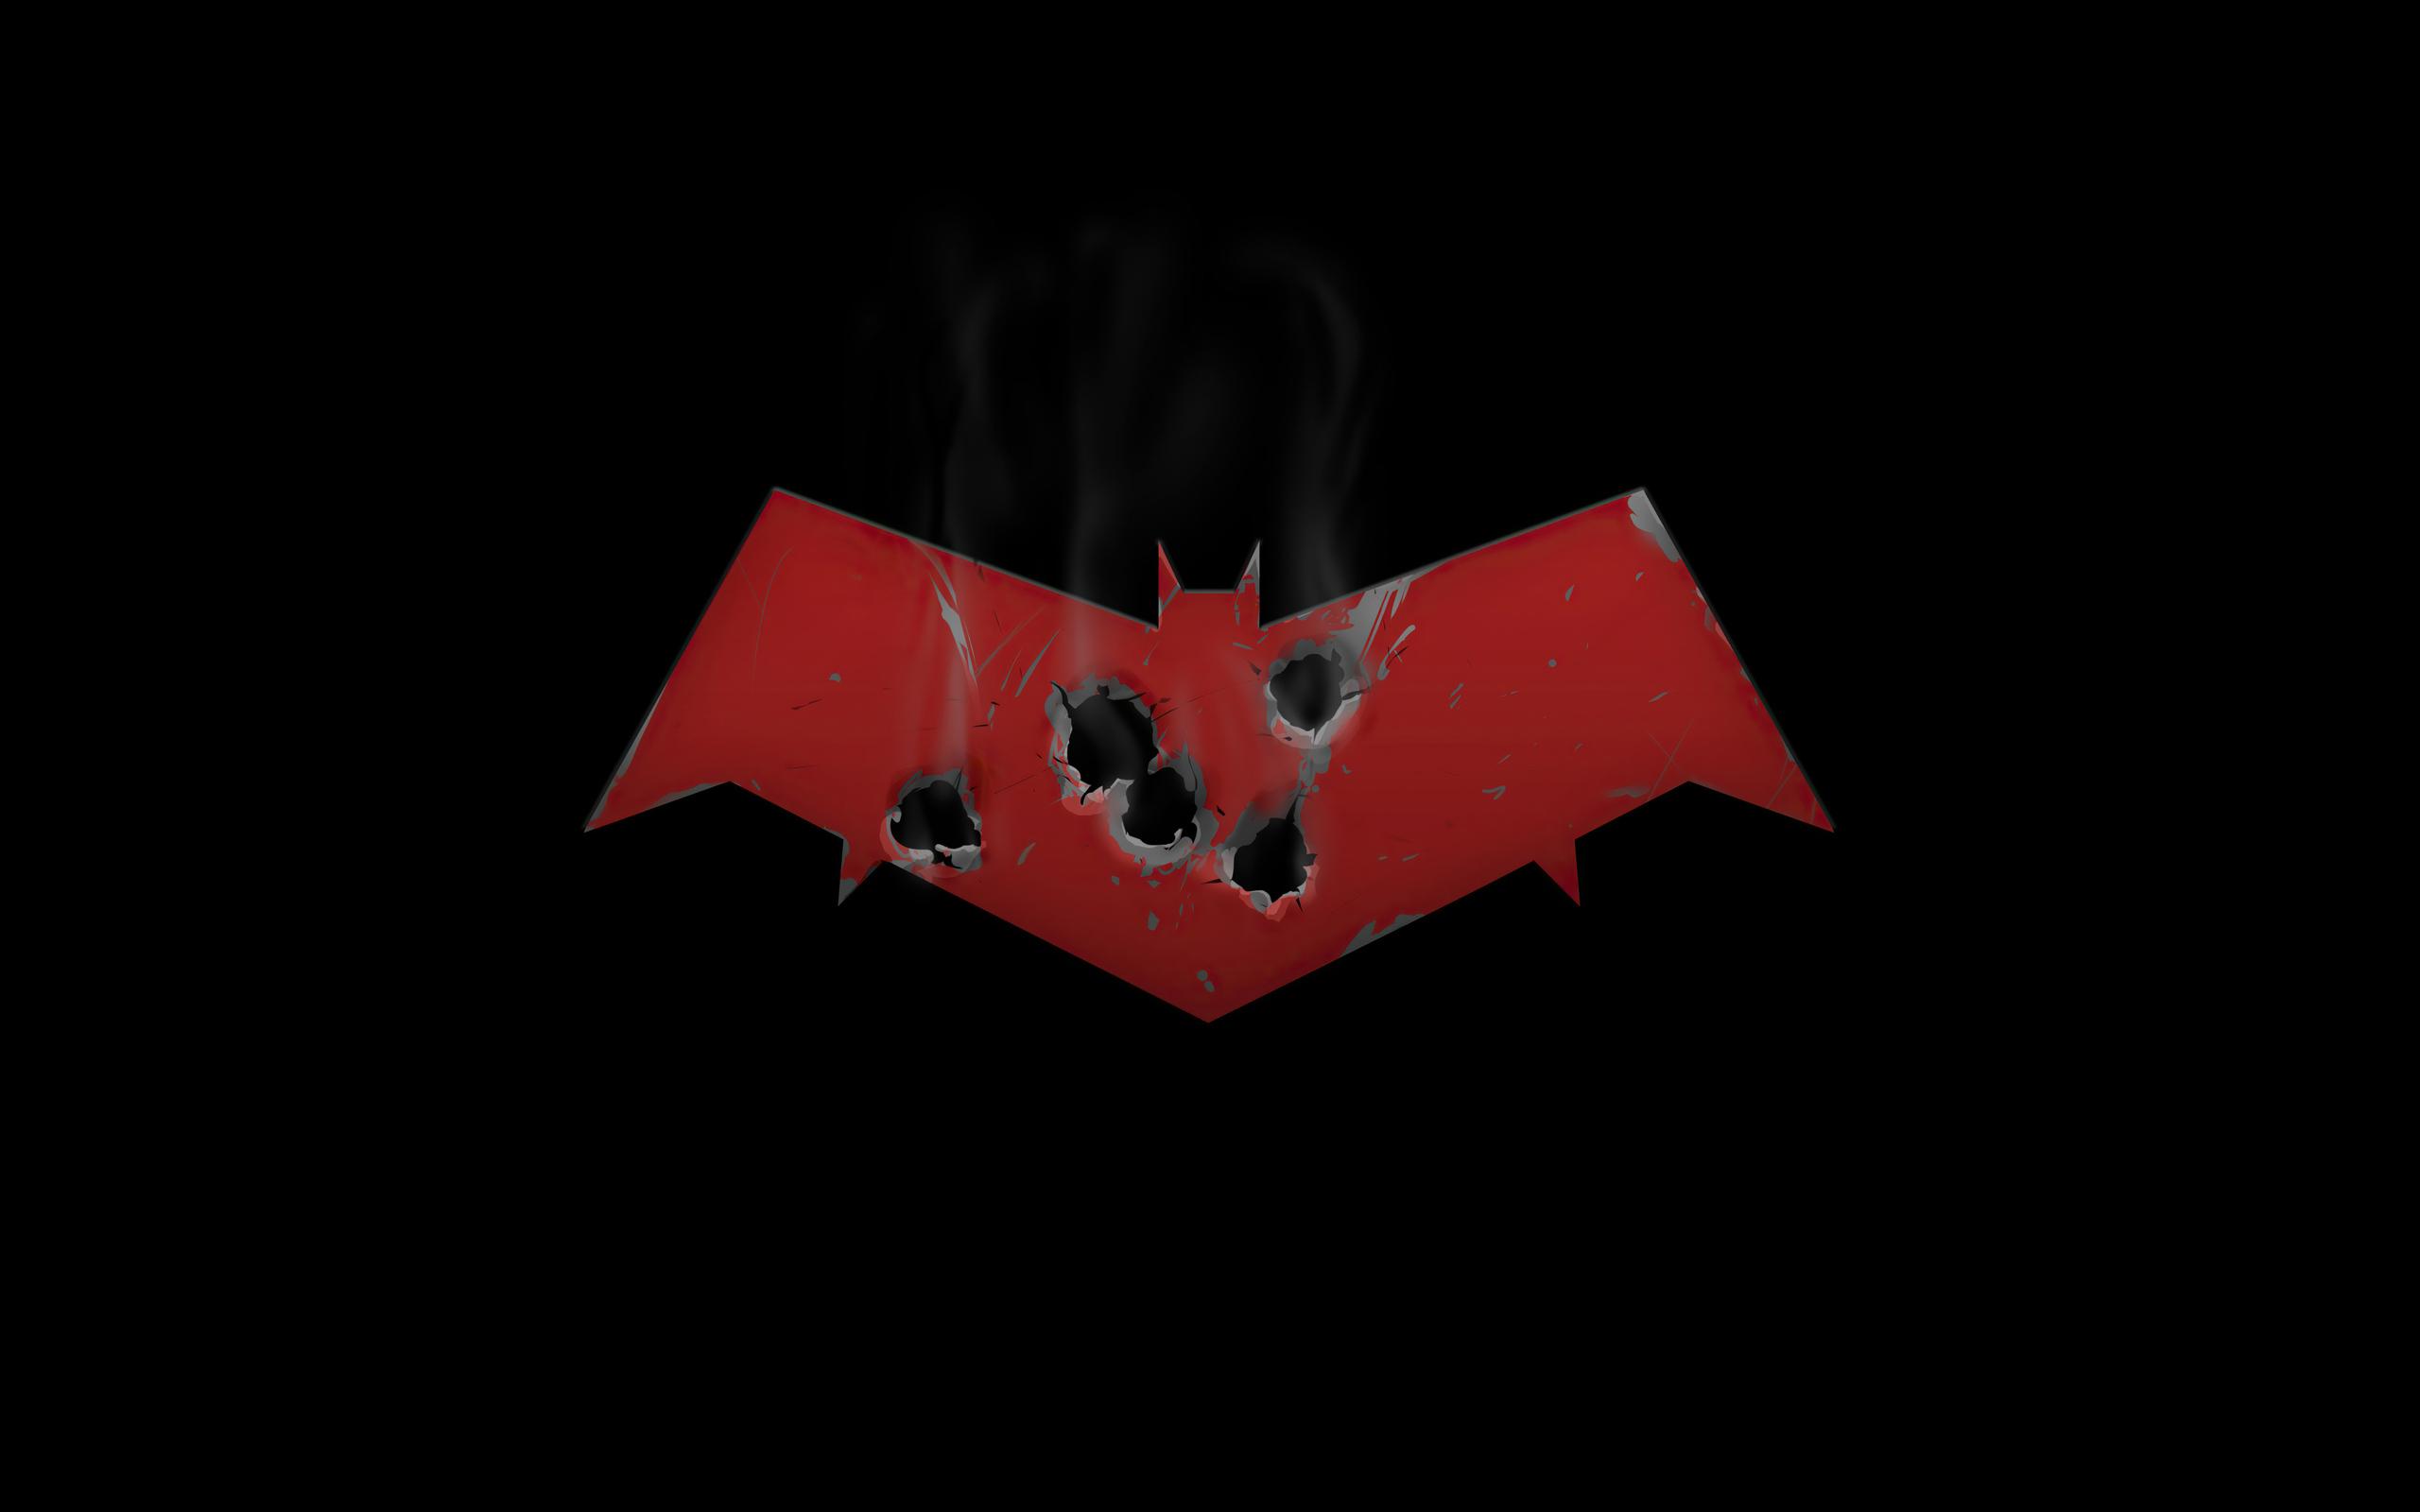 red-hood-vs-grifter-blood-money-logo-5k-8y.jpg